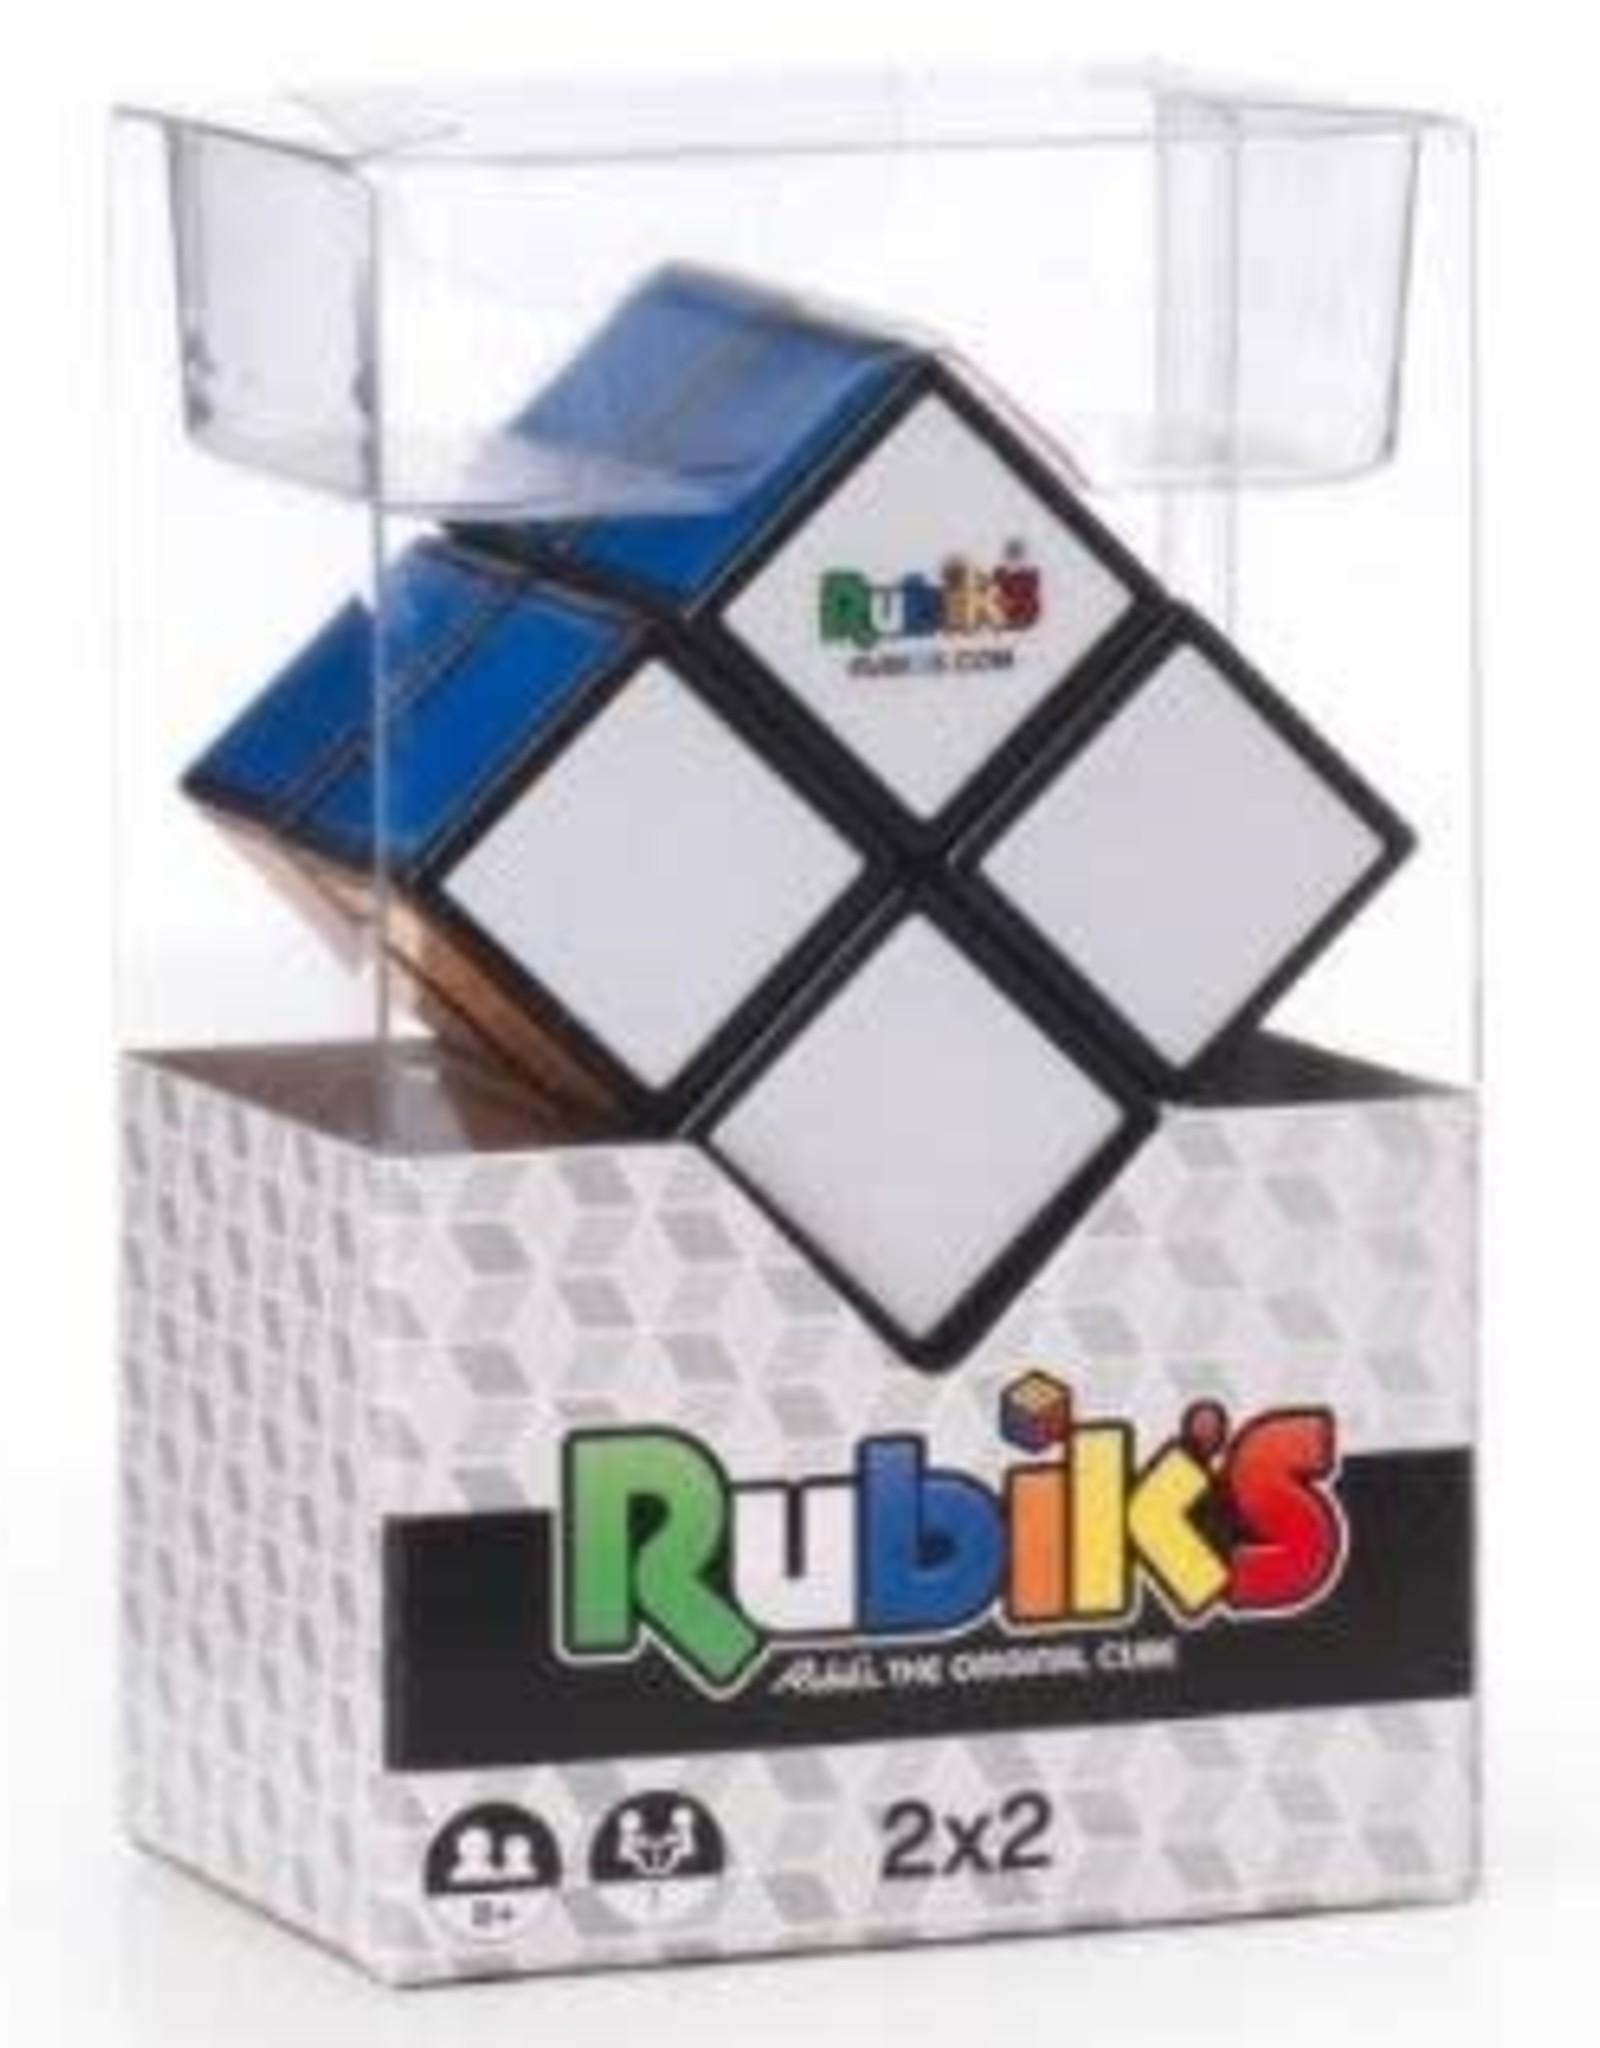 Rubik's Rubik's Mini Cube 2 x2